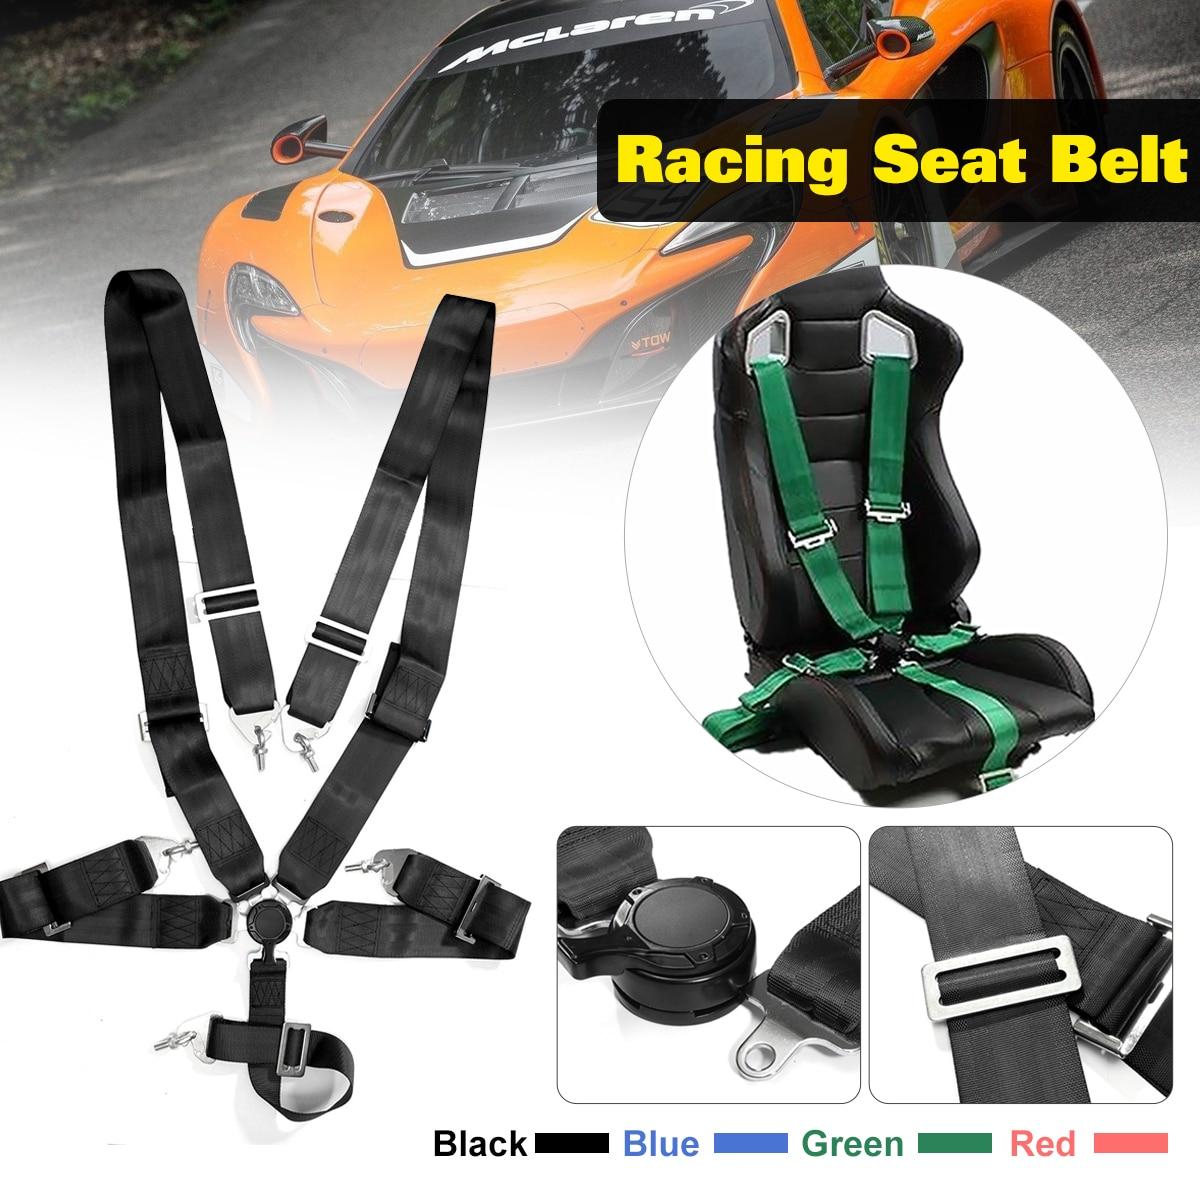 Auto Car Seat Belts 4 5 6 Point Seat Belt Sports Racing Harness Safety Belt Seat Harness With Camlock Seatbelt Seat Belts Padding Aliexpress